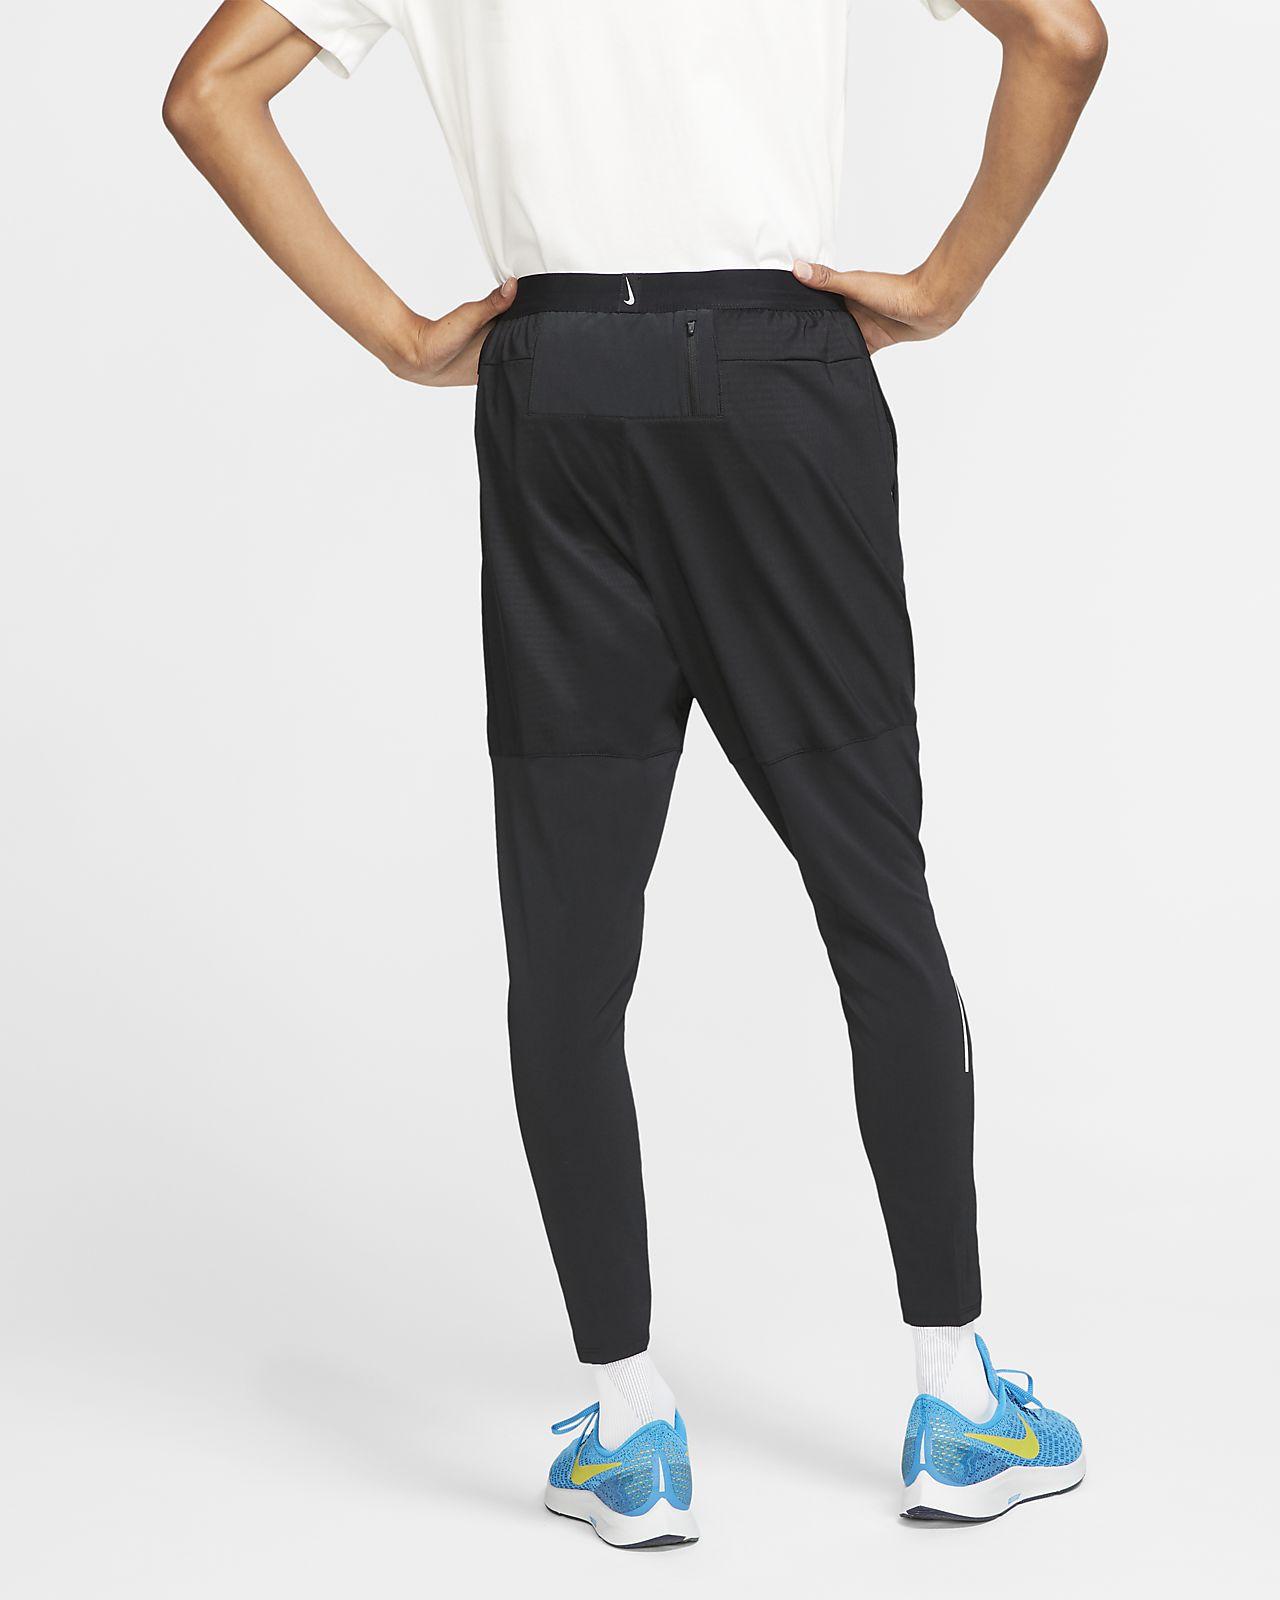 Pantaloni da running Nike Phenom Uomo